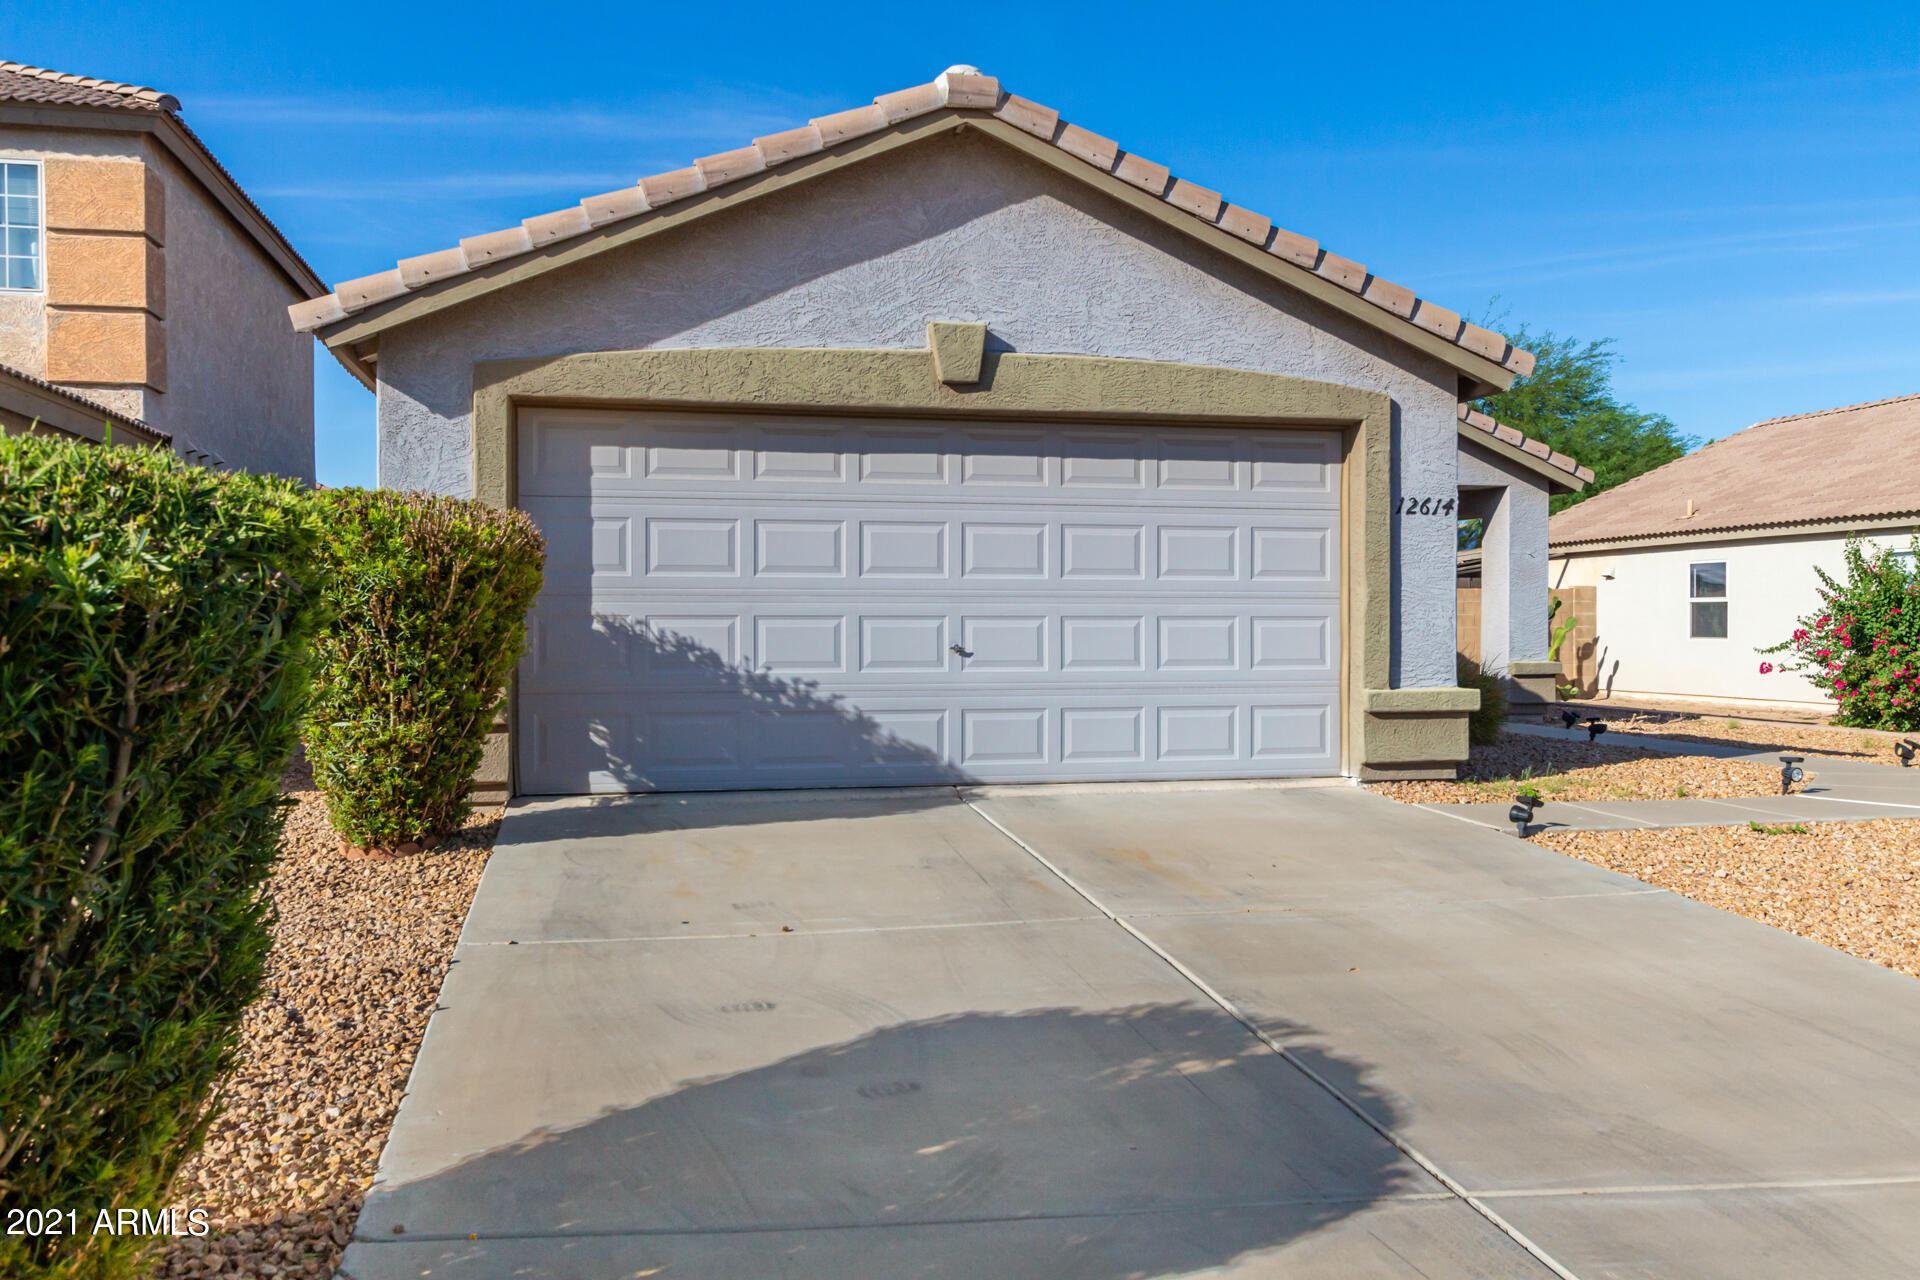 Photo of 12614 W WINDROSE Drive, El Mirage, AZ 85335 (MLS # 6304436)